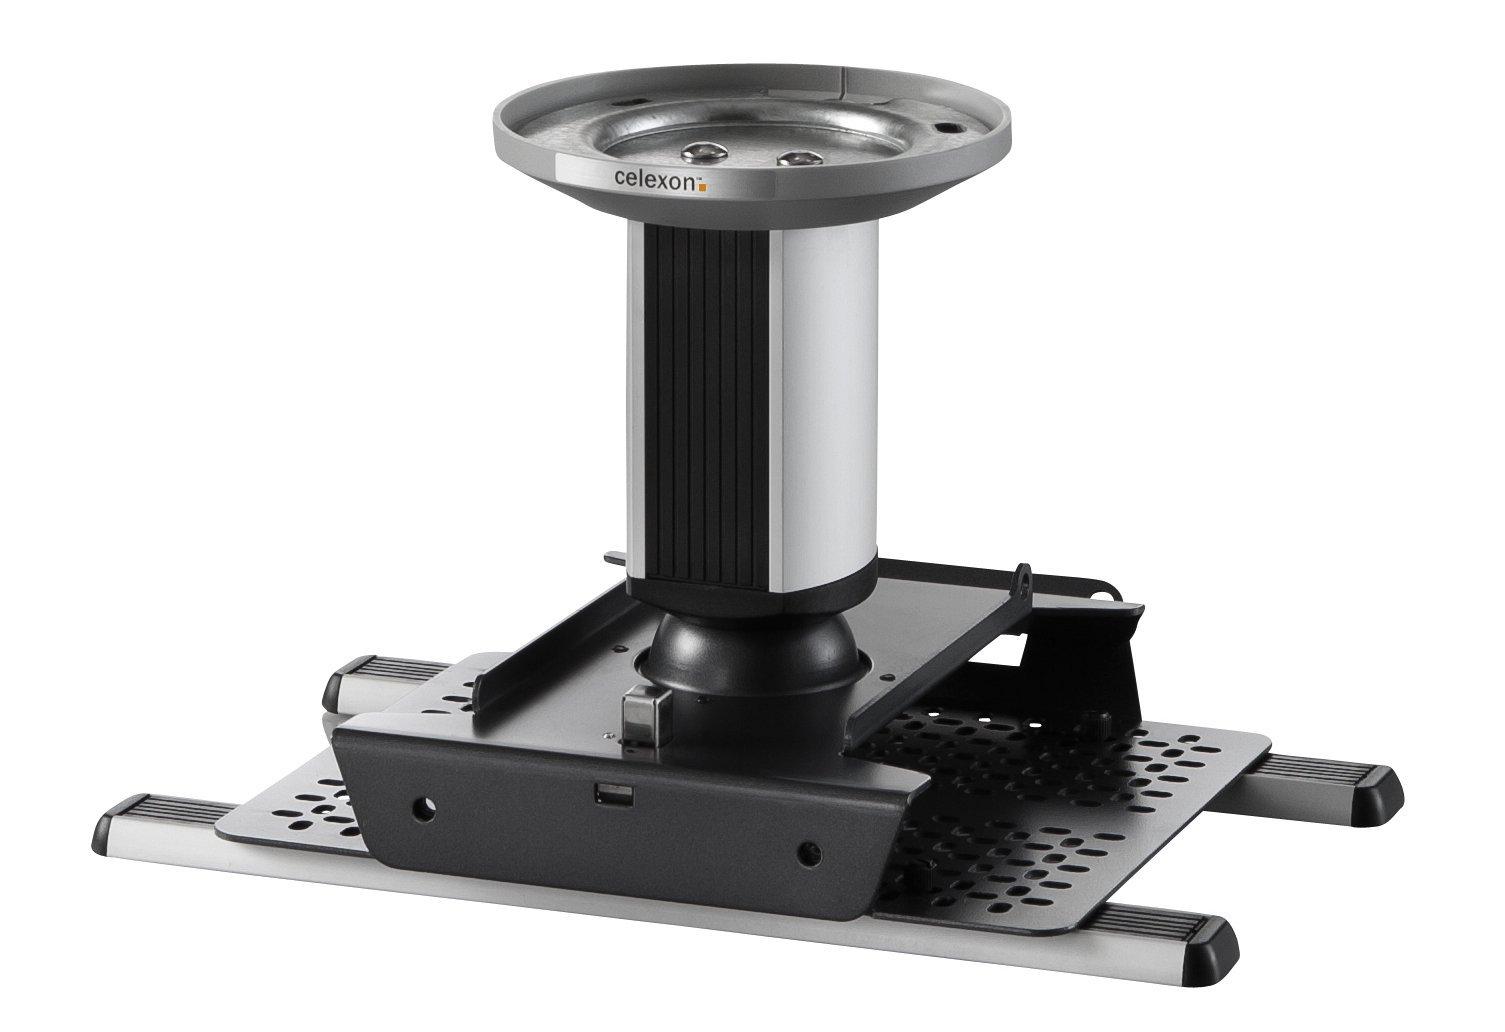 celexon Universal Projector Ceiling Mount Bracket MultiCel 1500 Expert, 6'' below the ceiling, maximum load of 55 lbs